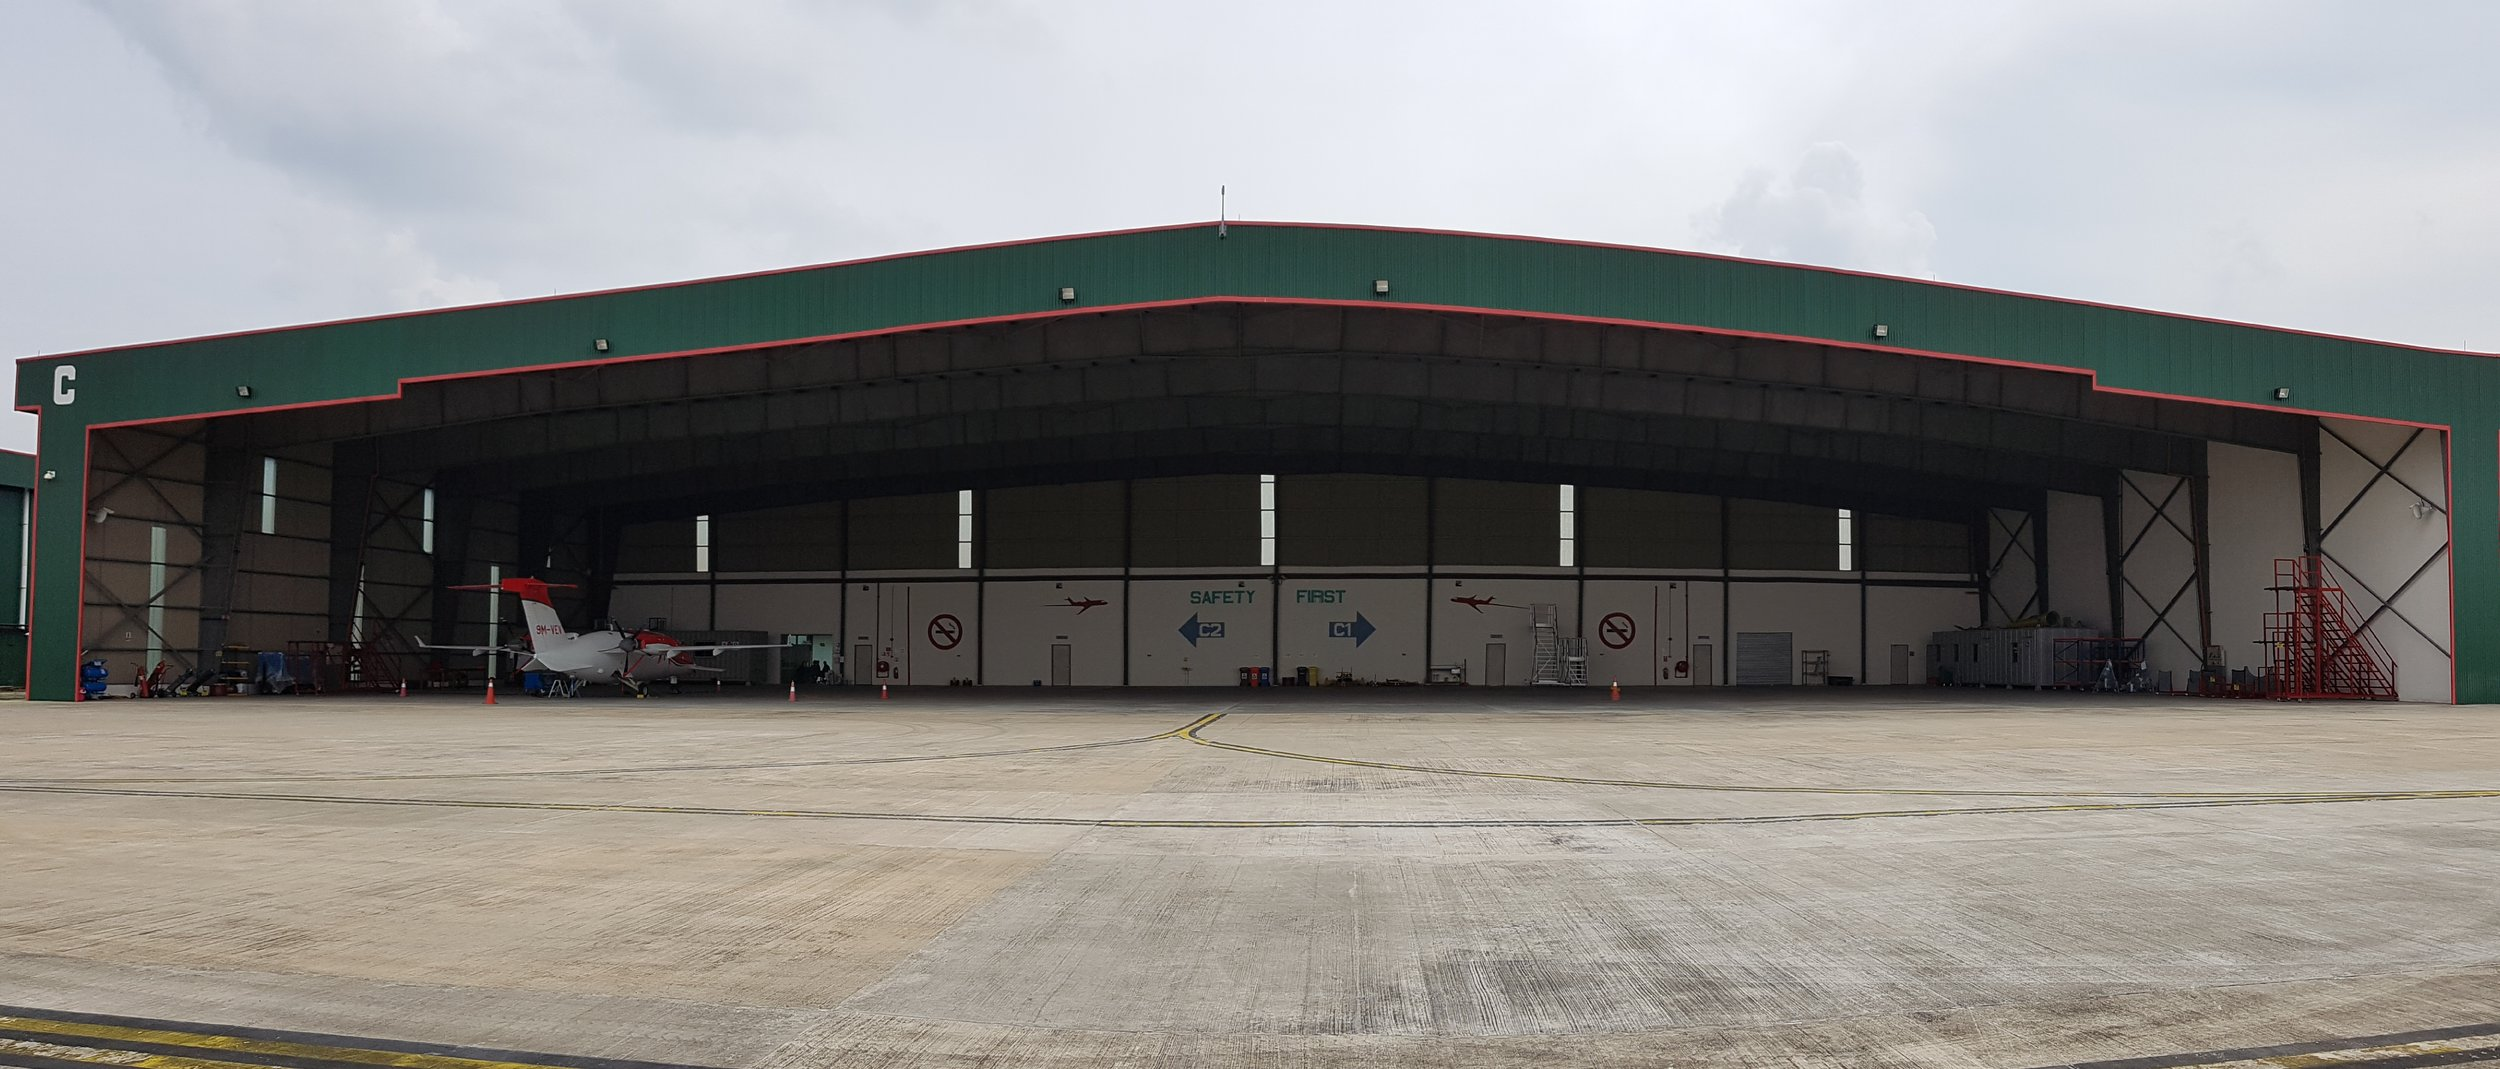 A Piaggio Avanti Evo docked at Hangar C, Skypark RAC, awaiting maintenance service.